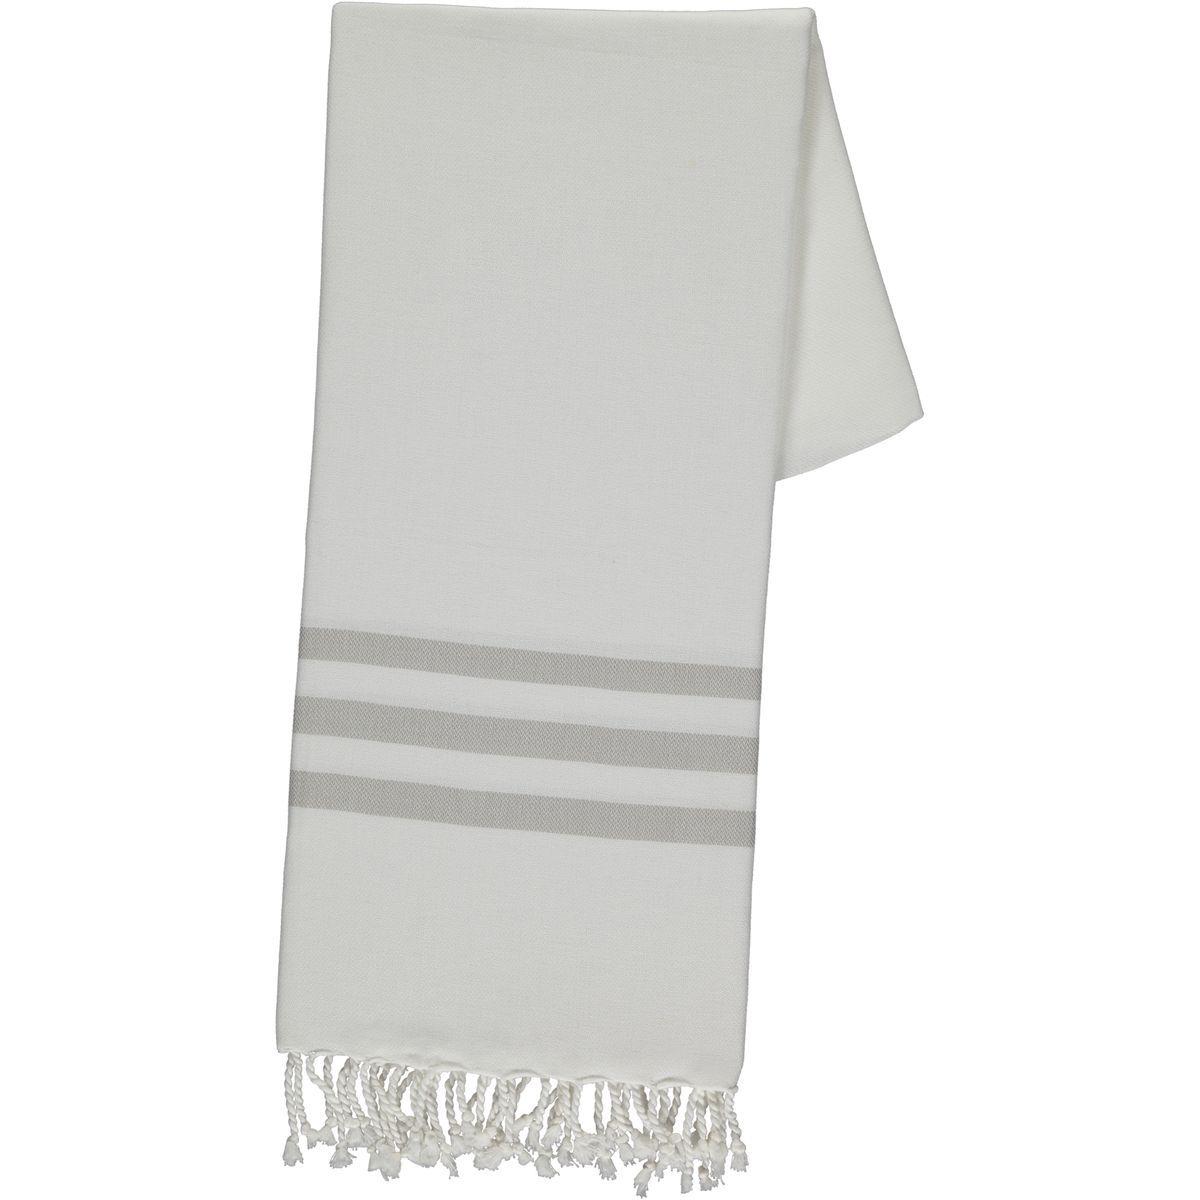 Peshtemal Bala Sultan - Taupe Stripes